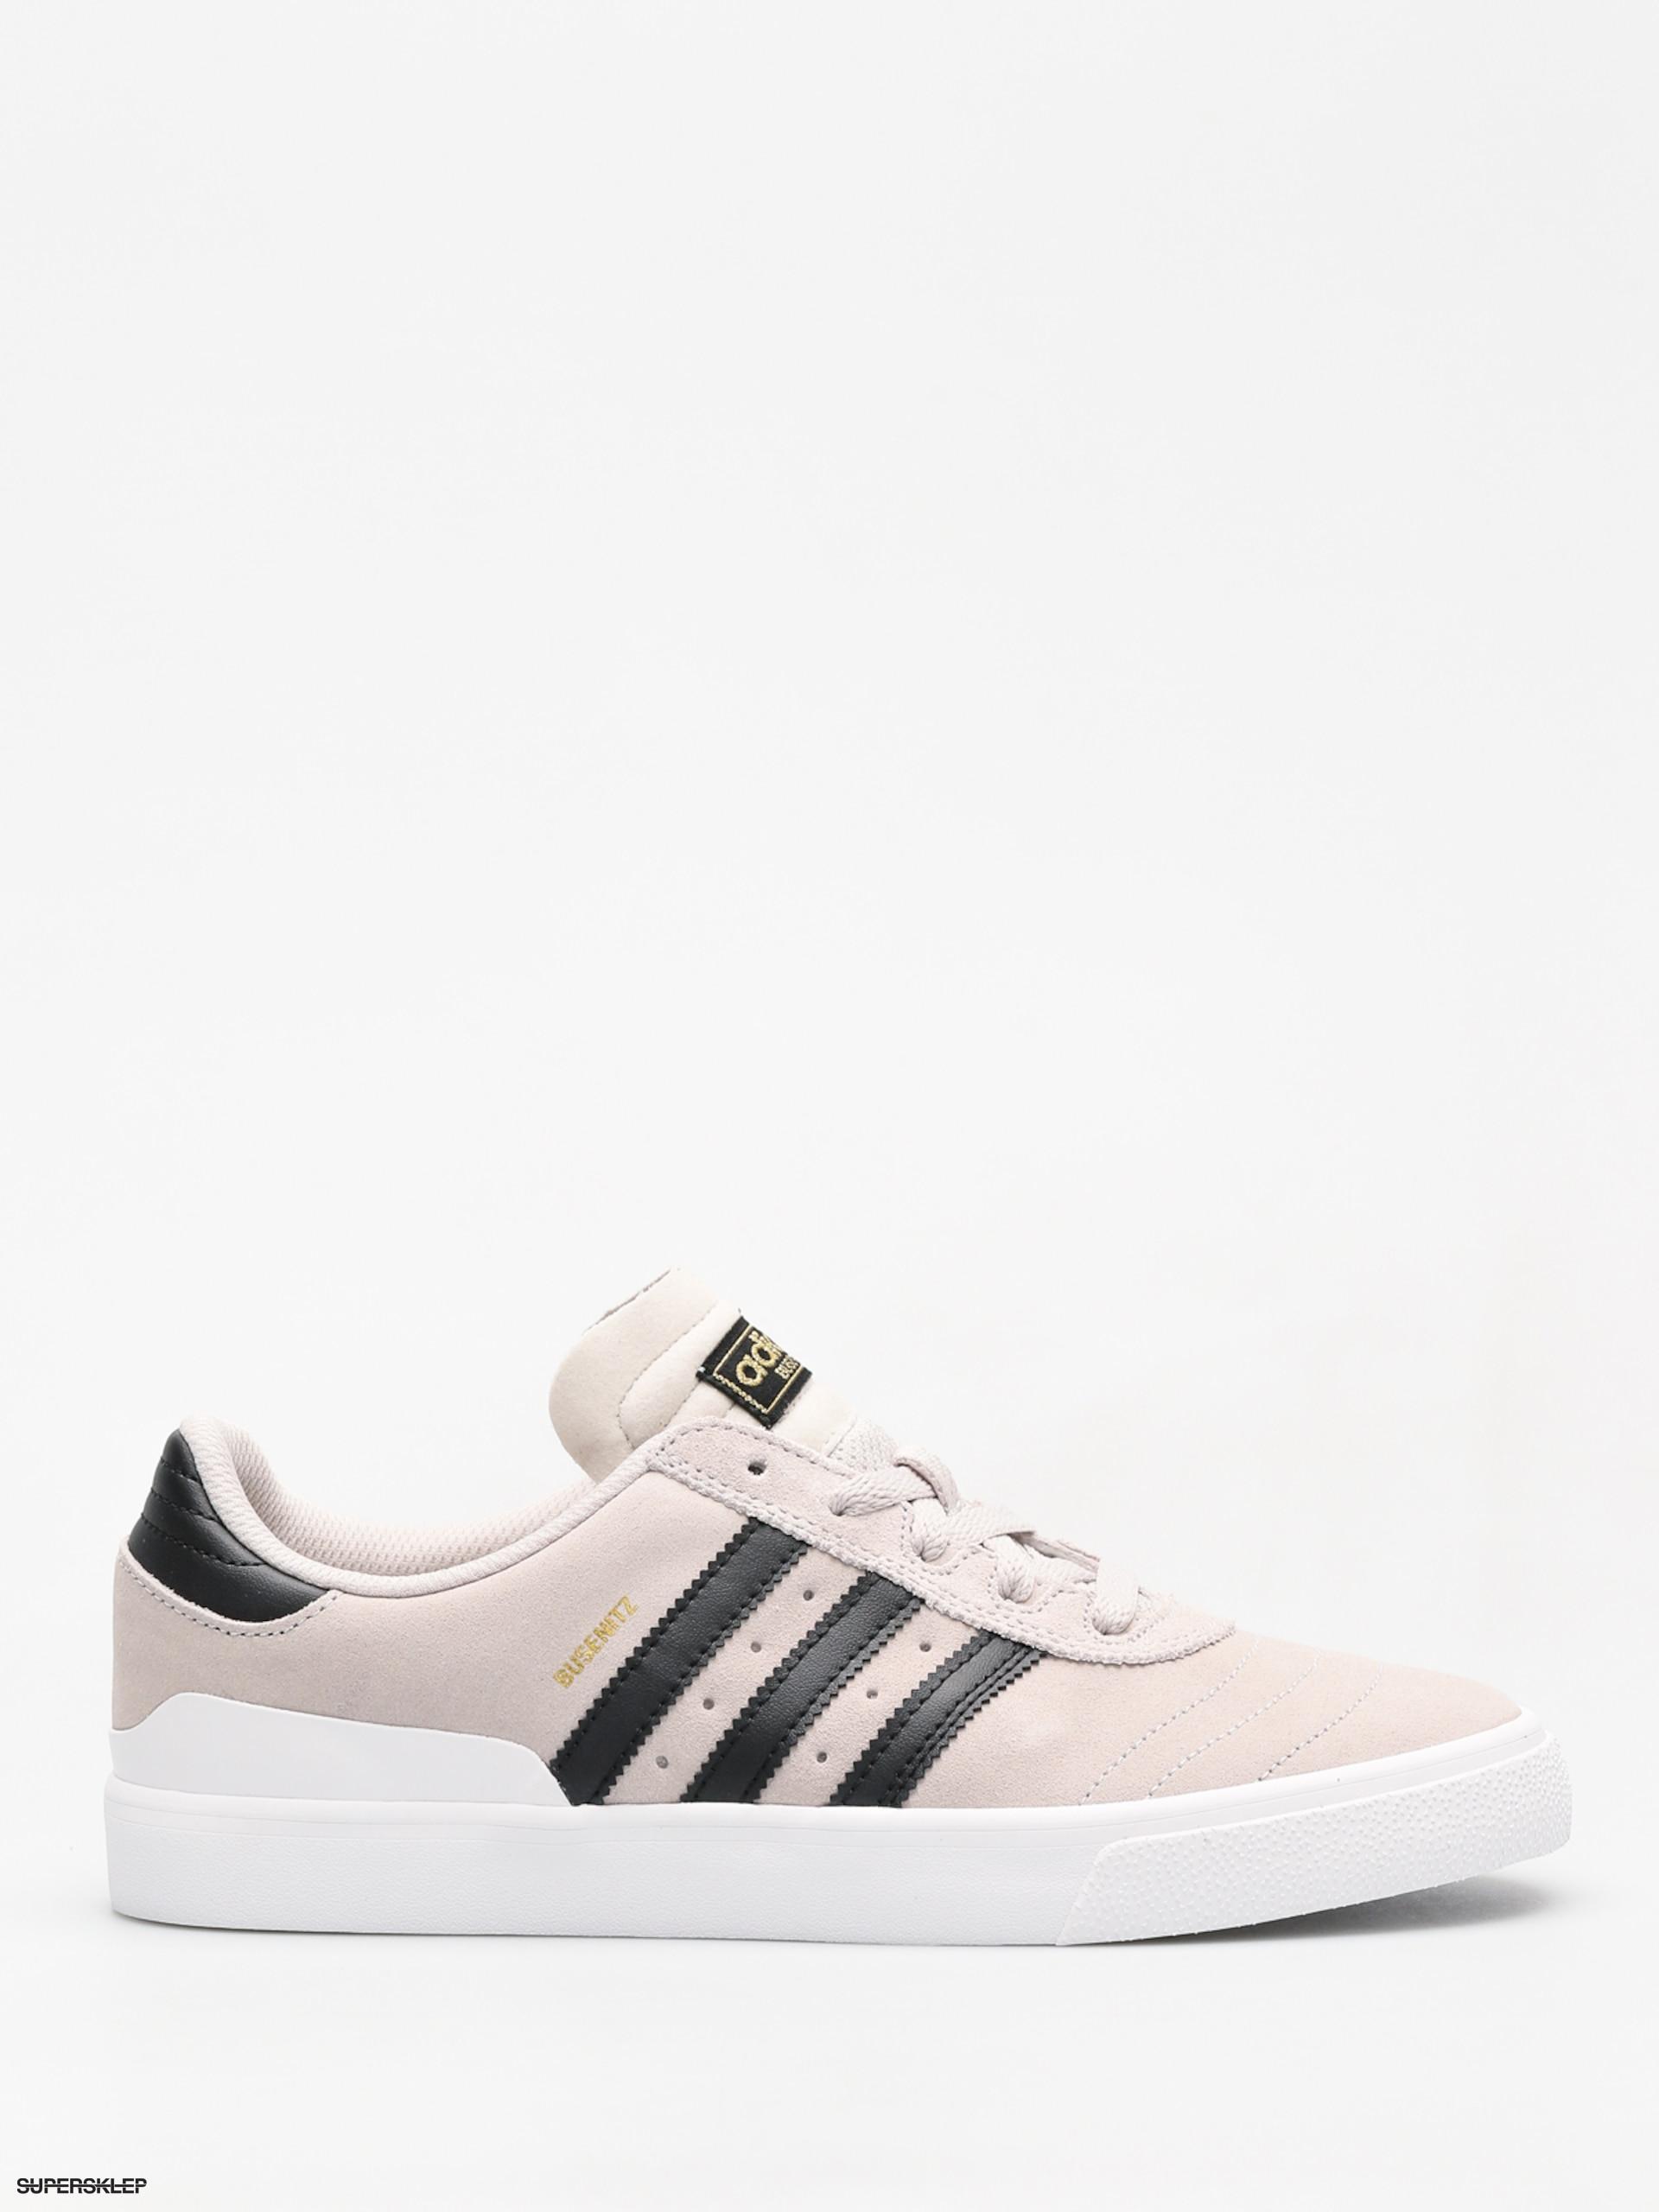 4054af87e86b0 Buty adidas Busenitz Vulc (crystal white/core black/ftwr white)